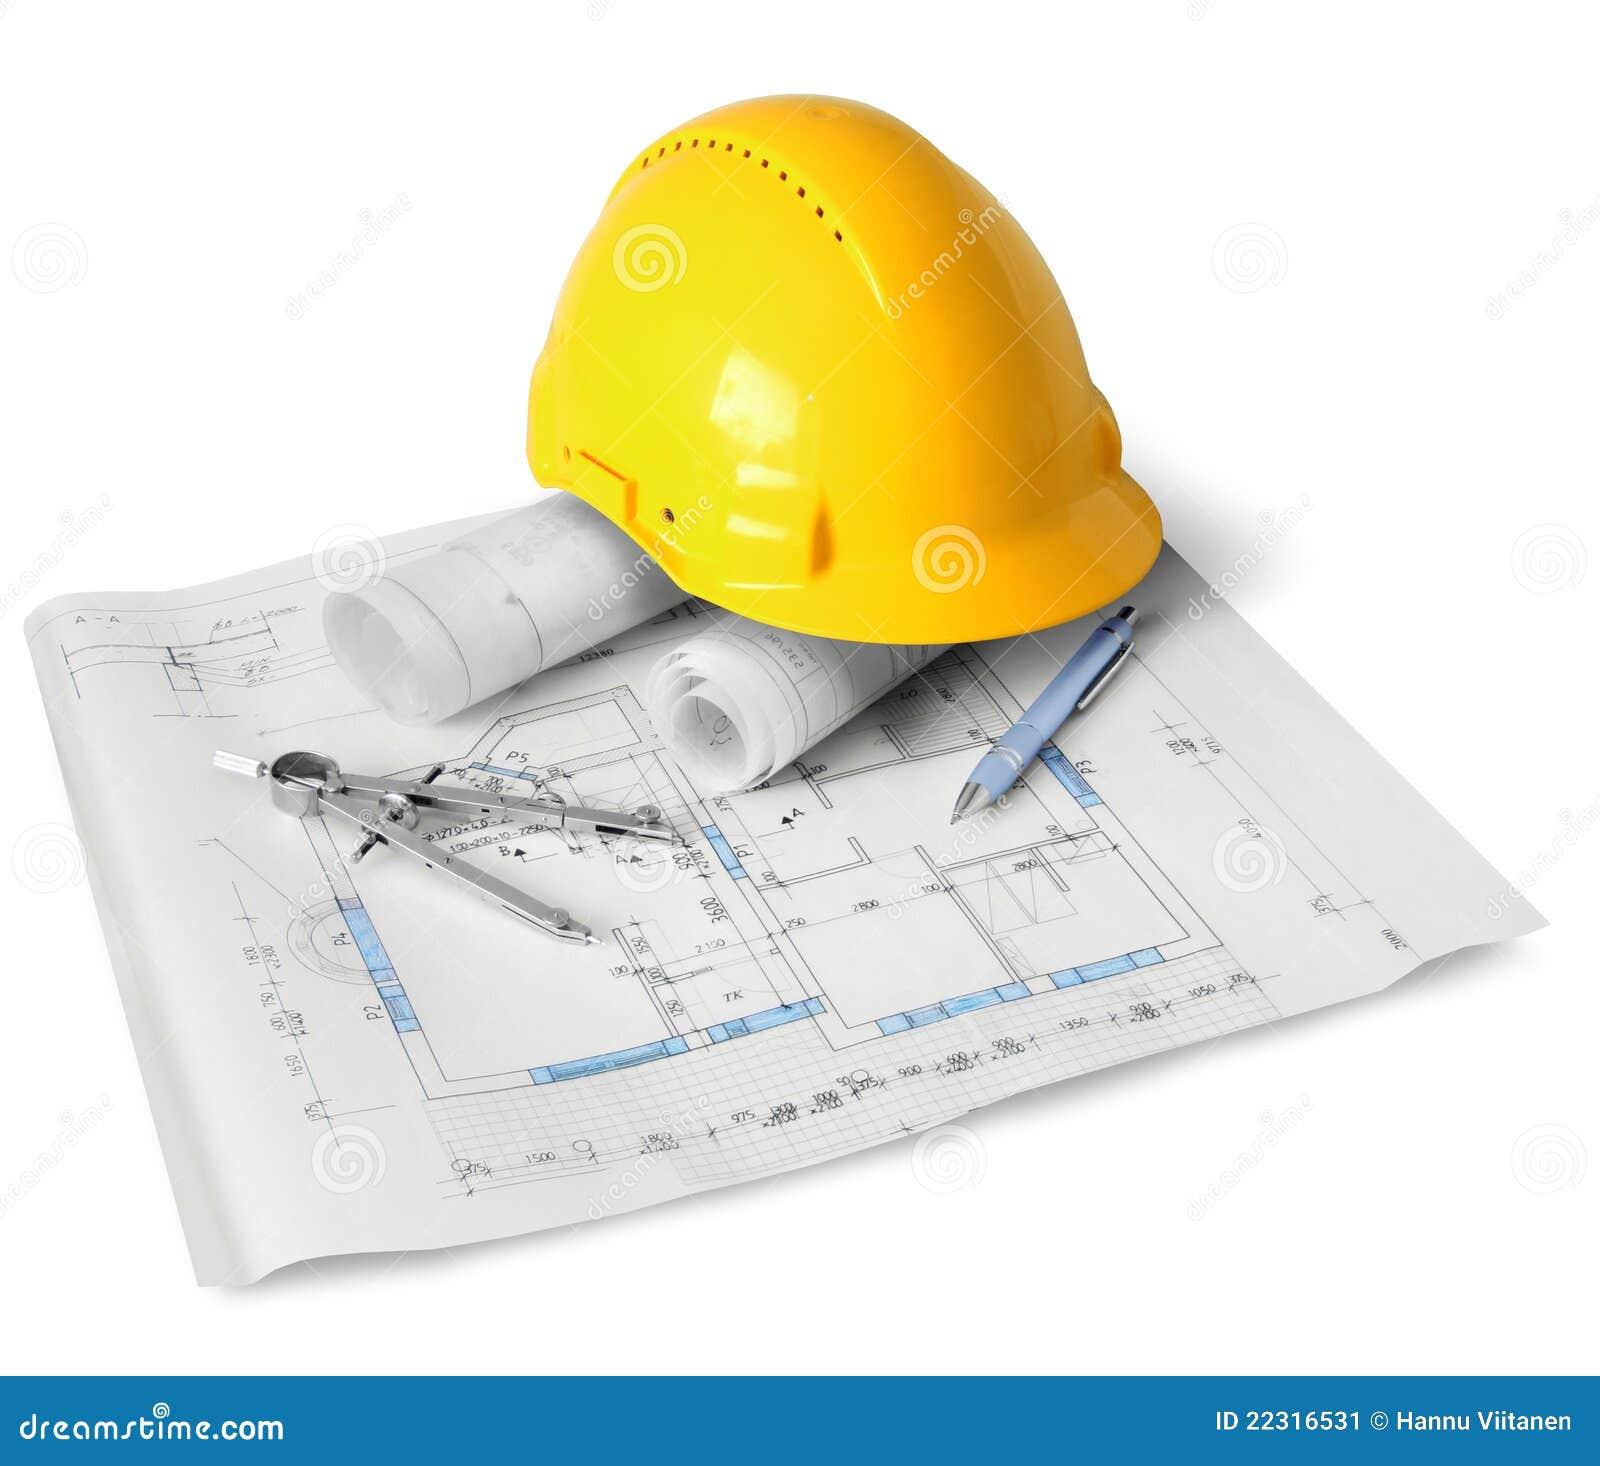 outils de plan de construction image stock image 22316531. Black Bedroom Furniture Sets. Home Design Ideas